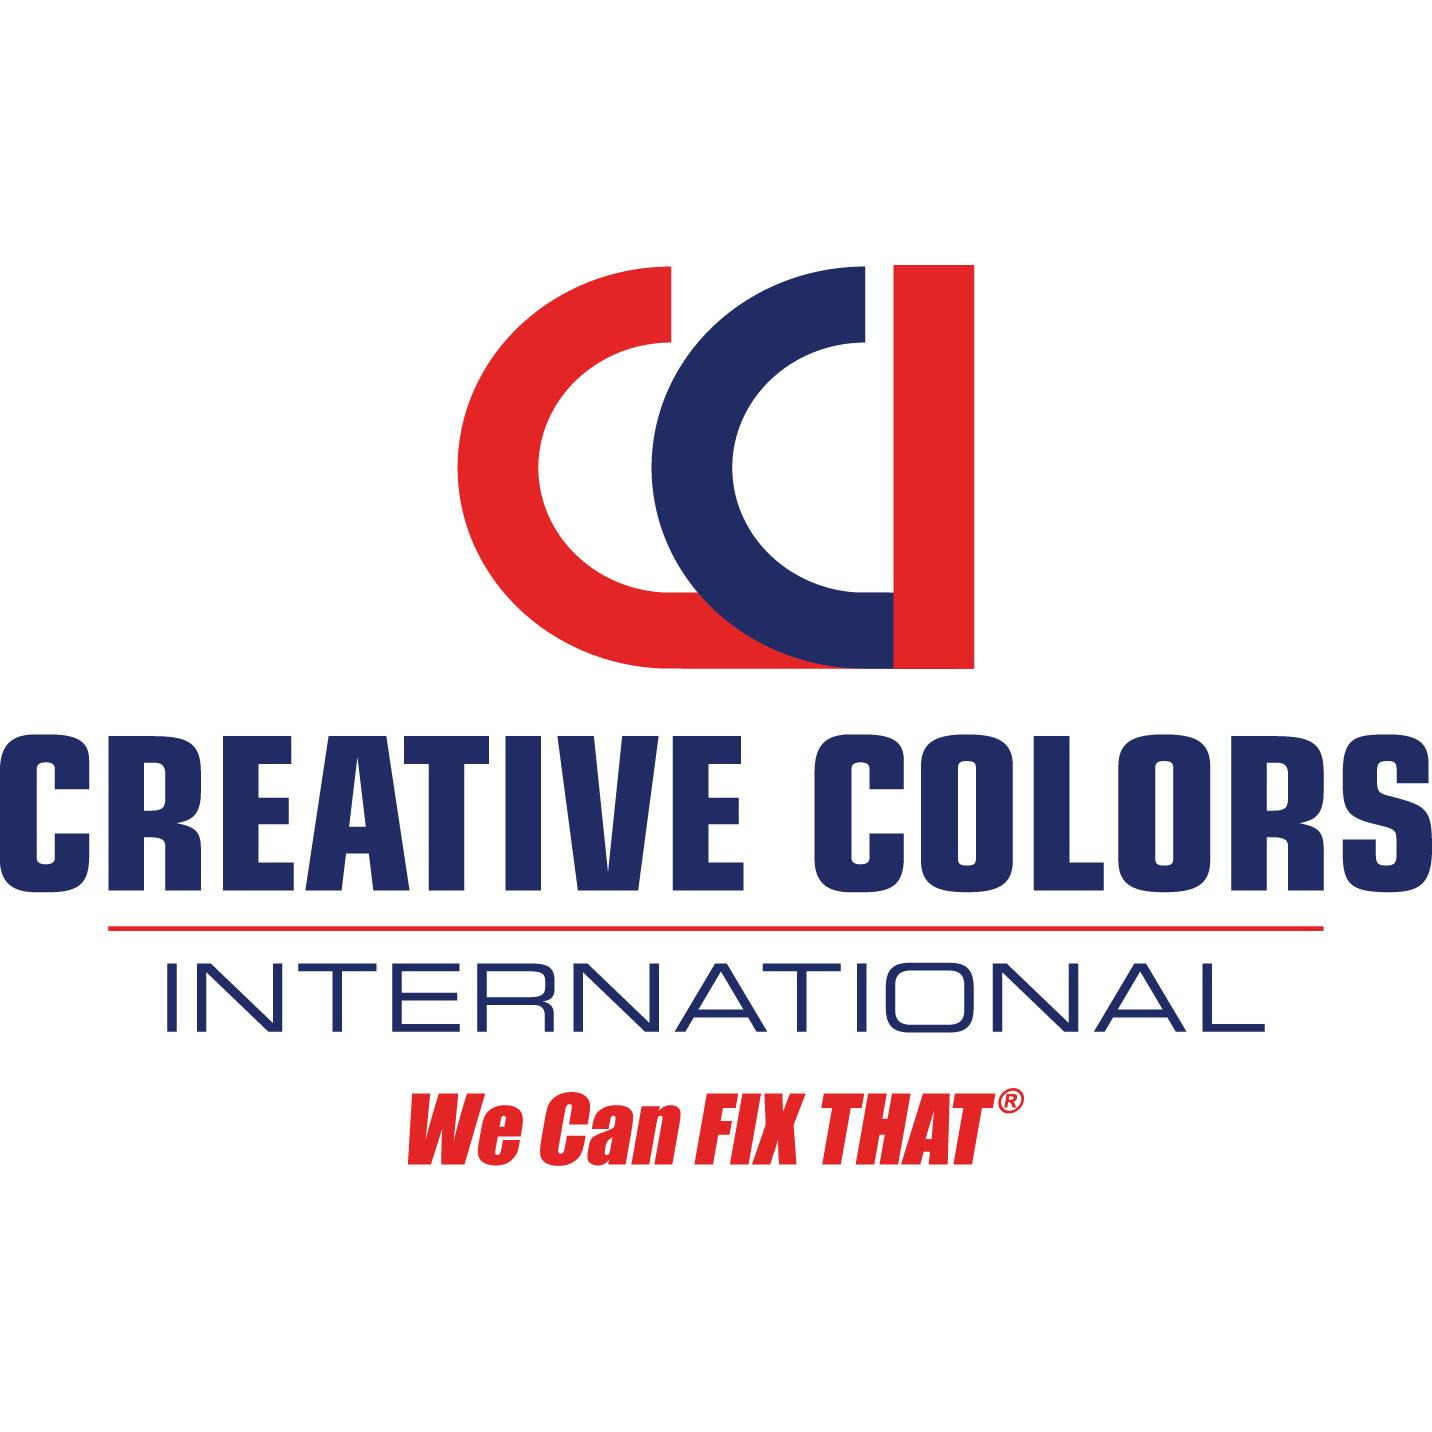 Creative Colors International-We Can Fix That - Alpharetta GA